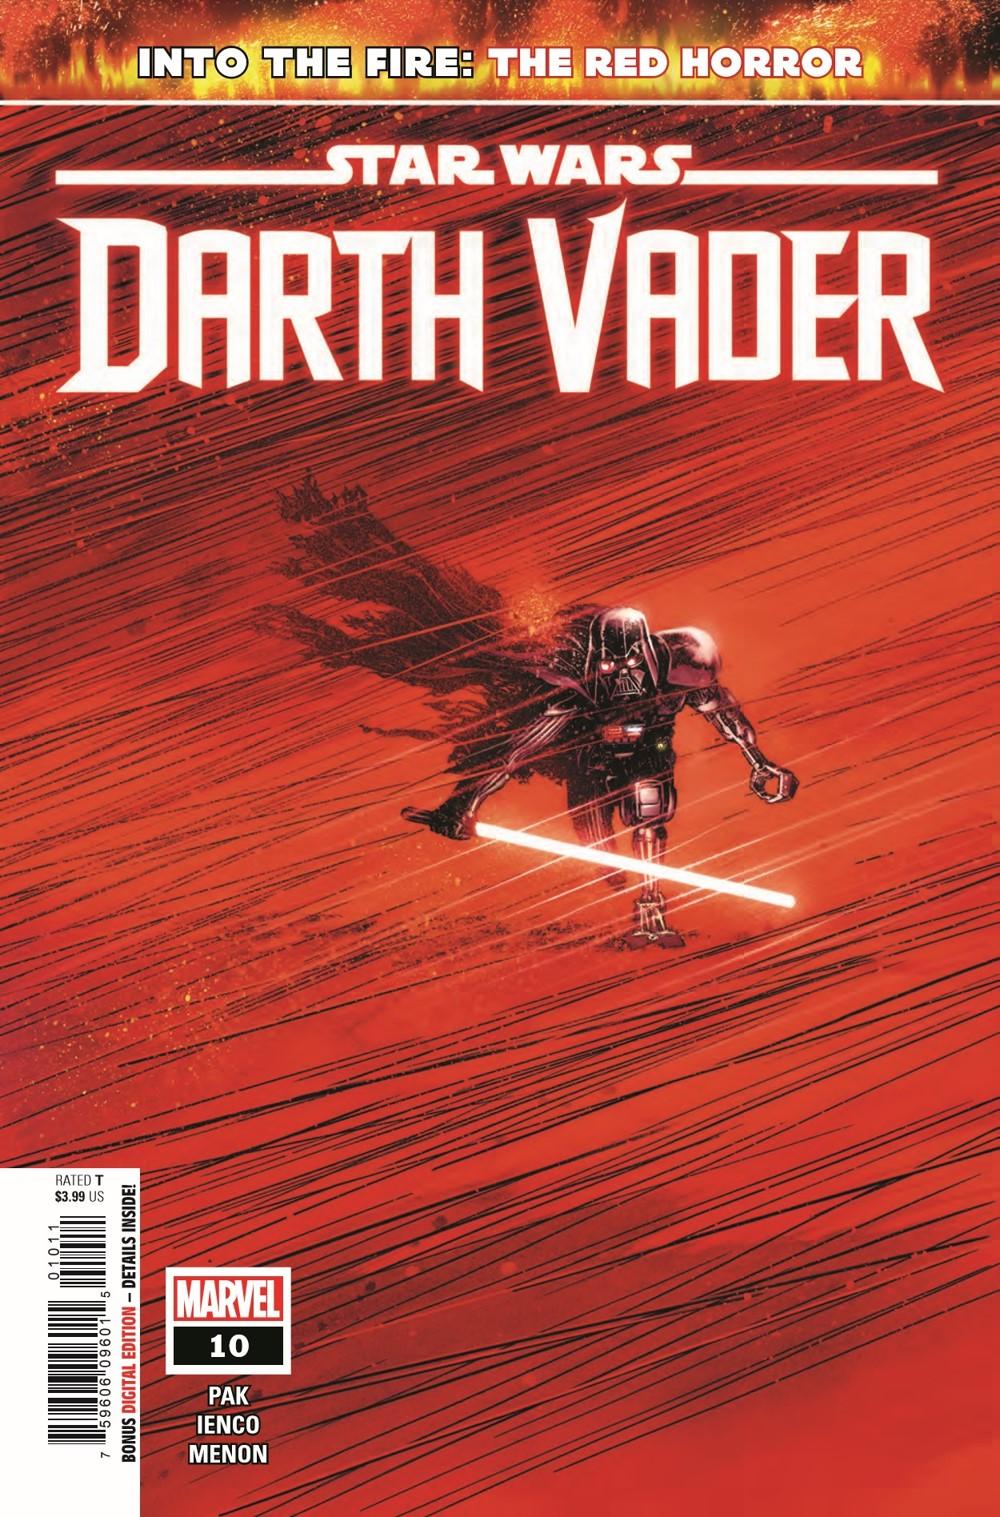 STWVADER2020010_Preview-1 ComicList Previews: STAR WARS DARTH VADER #10